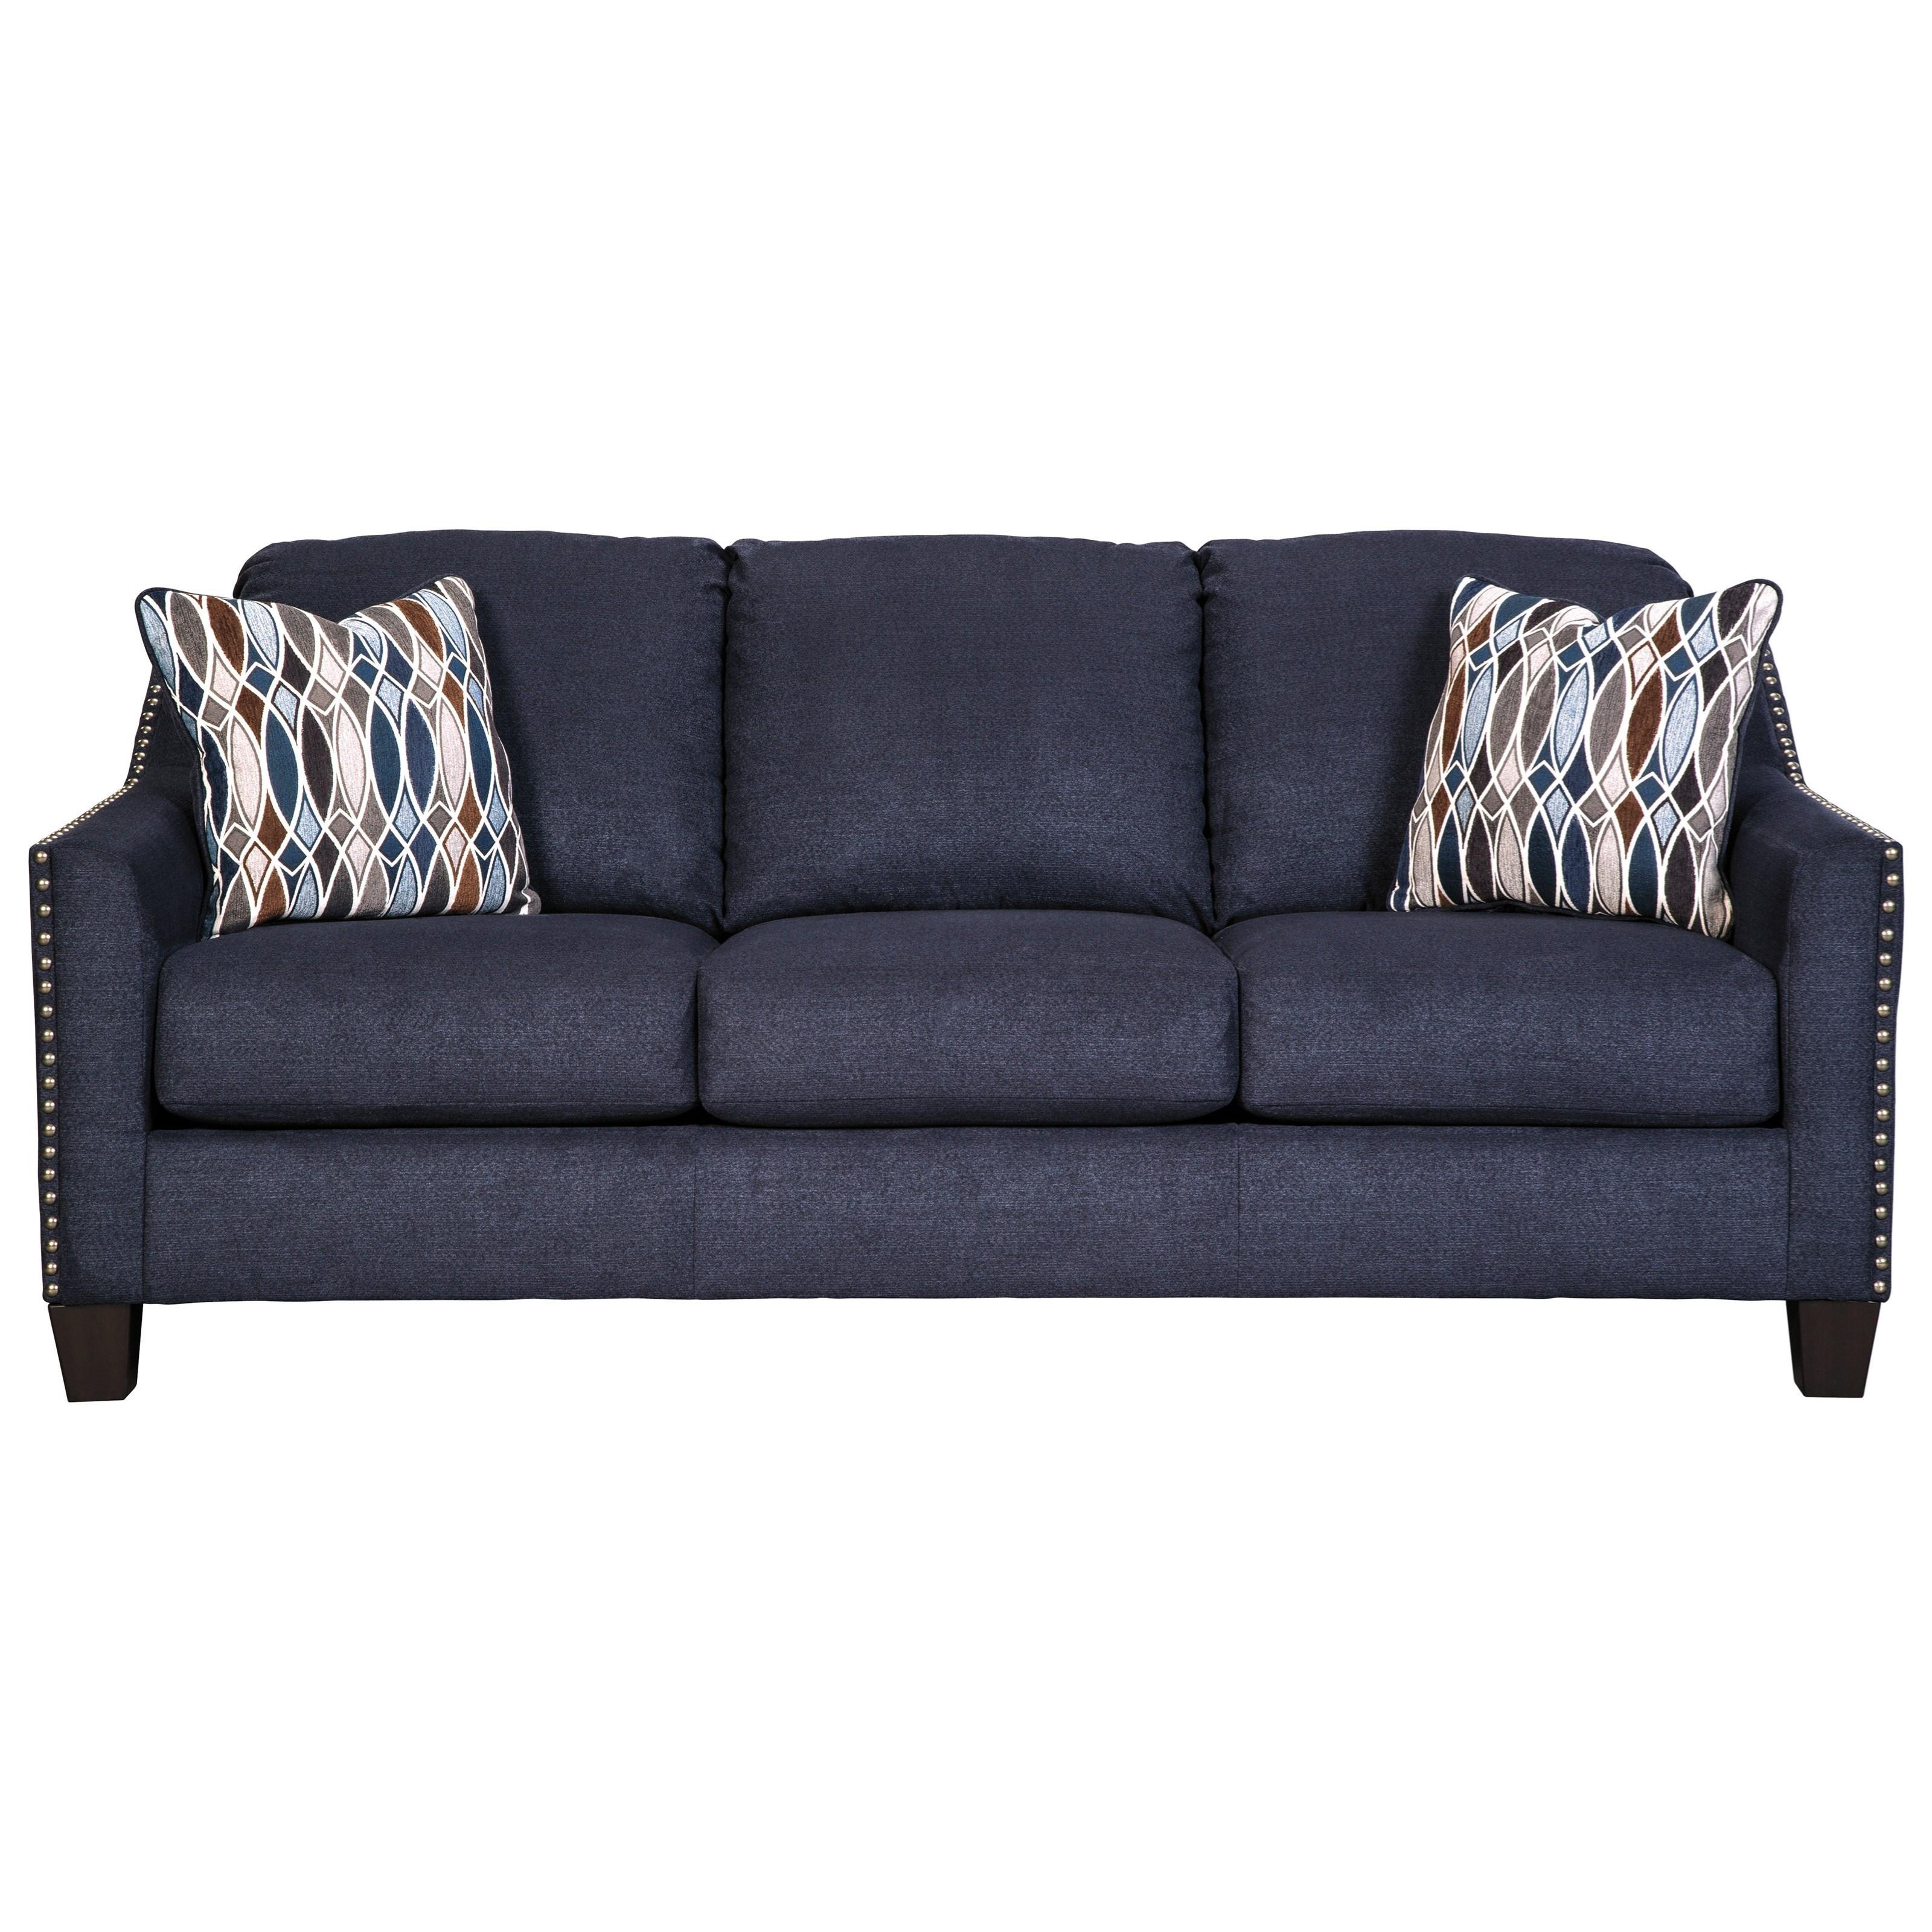 Sofa with Nailhead Studs